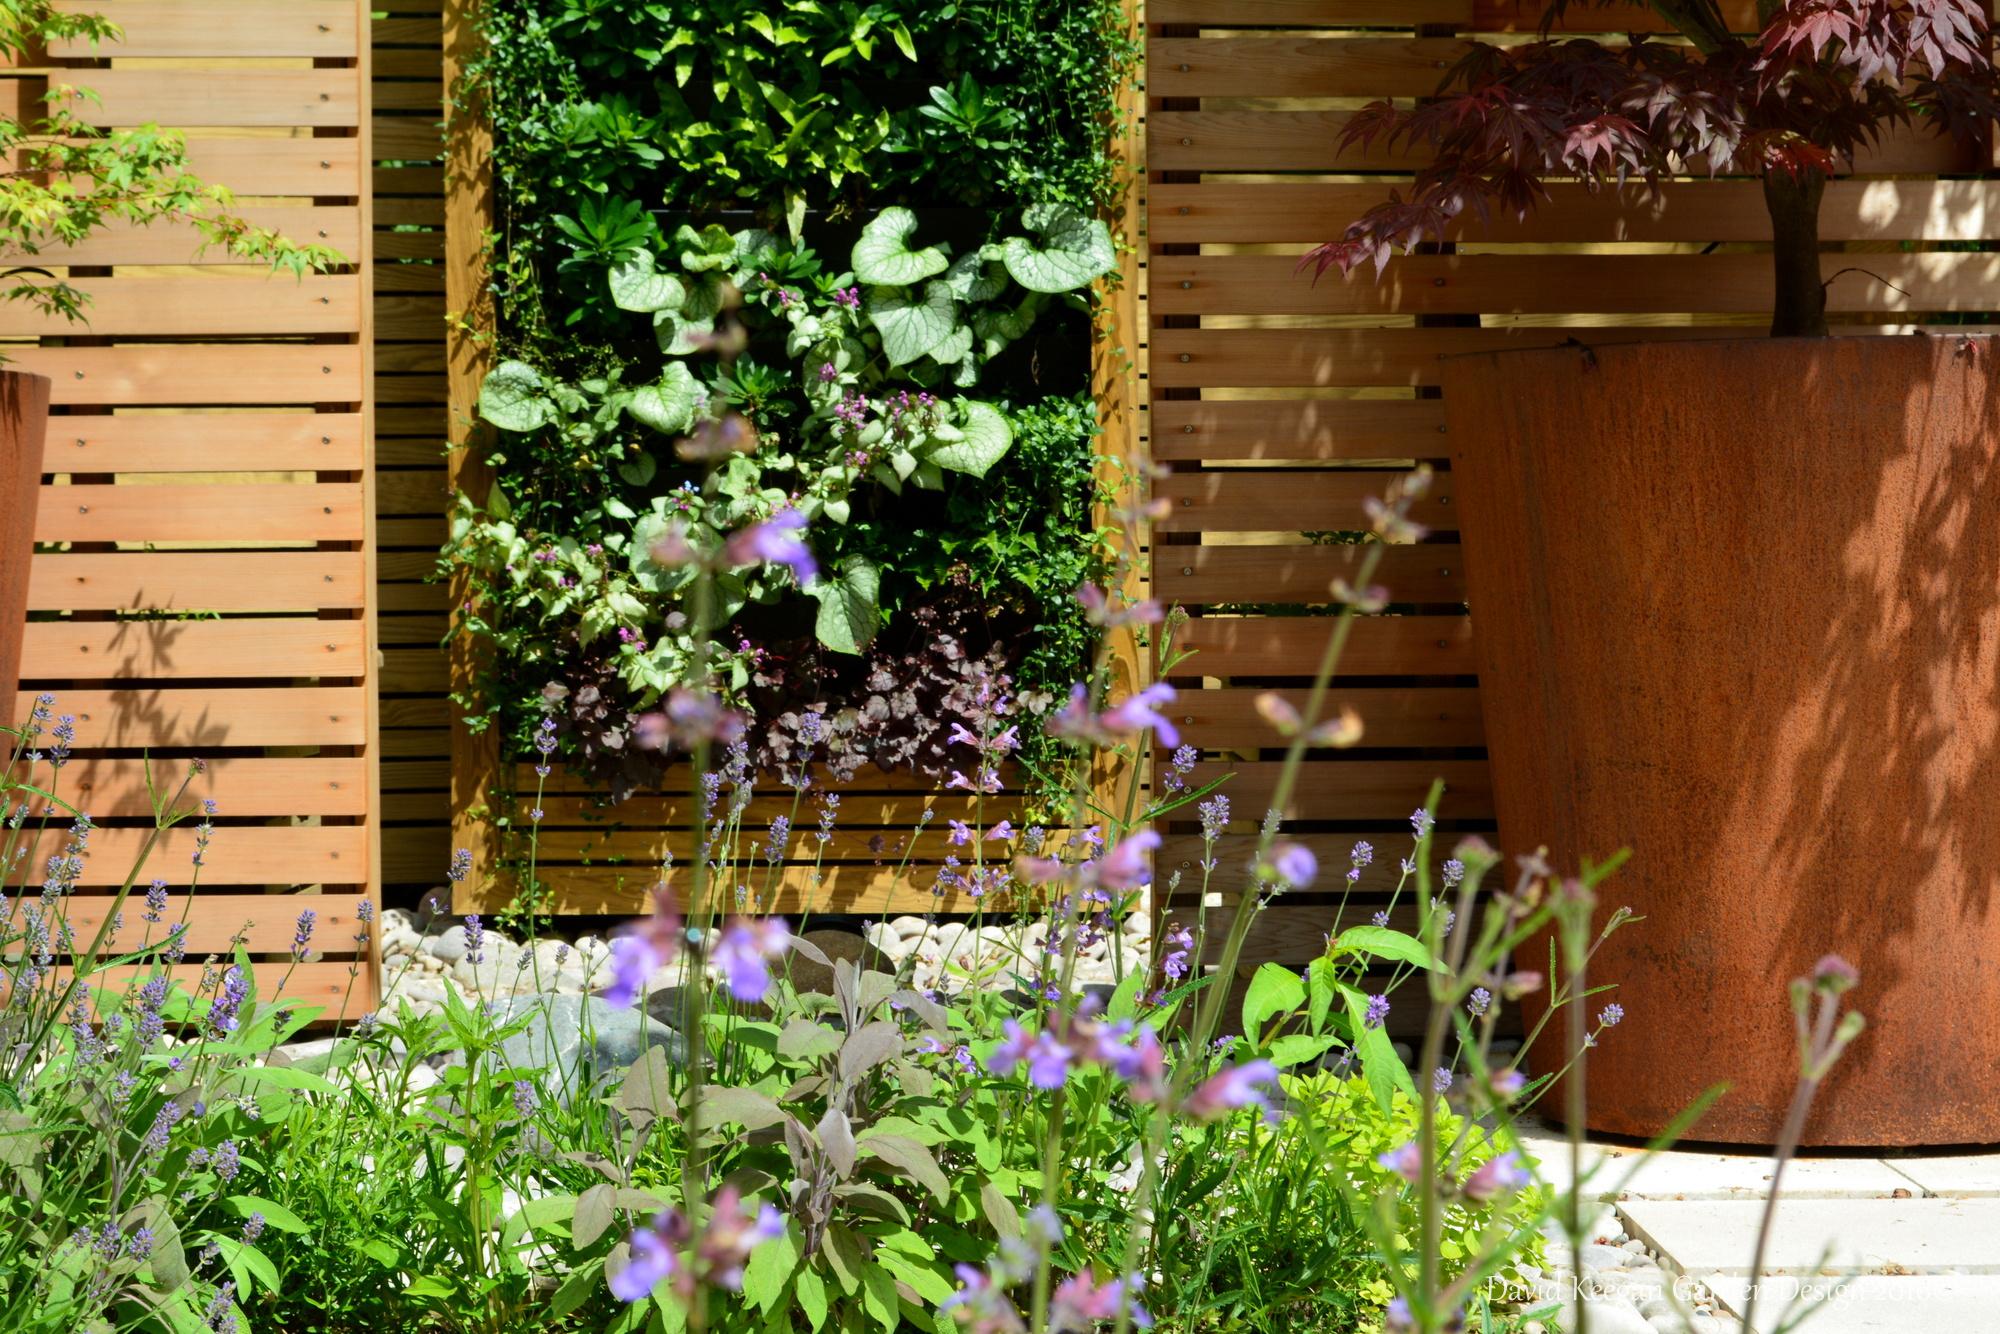 dkgardendesign | Garden design blog of international award winning ...